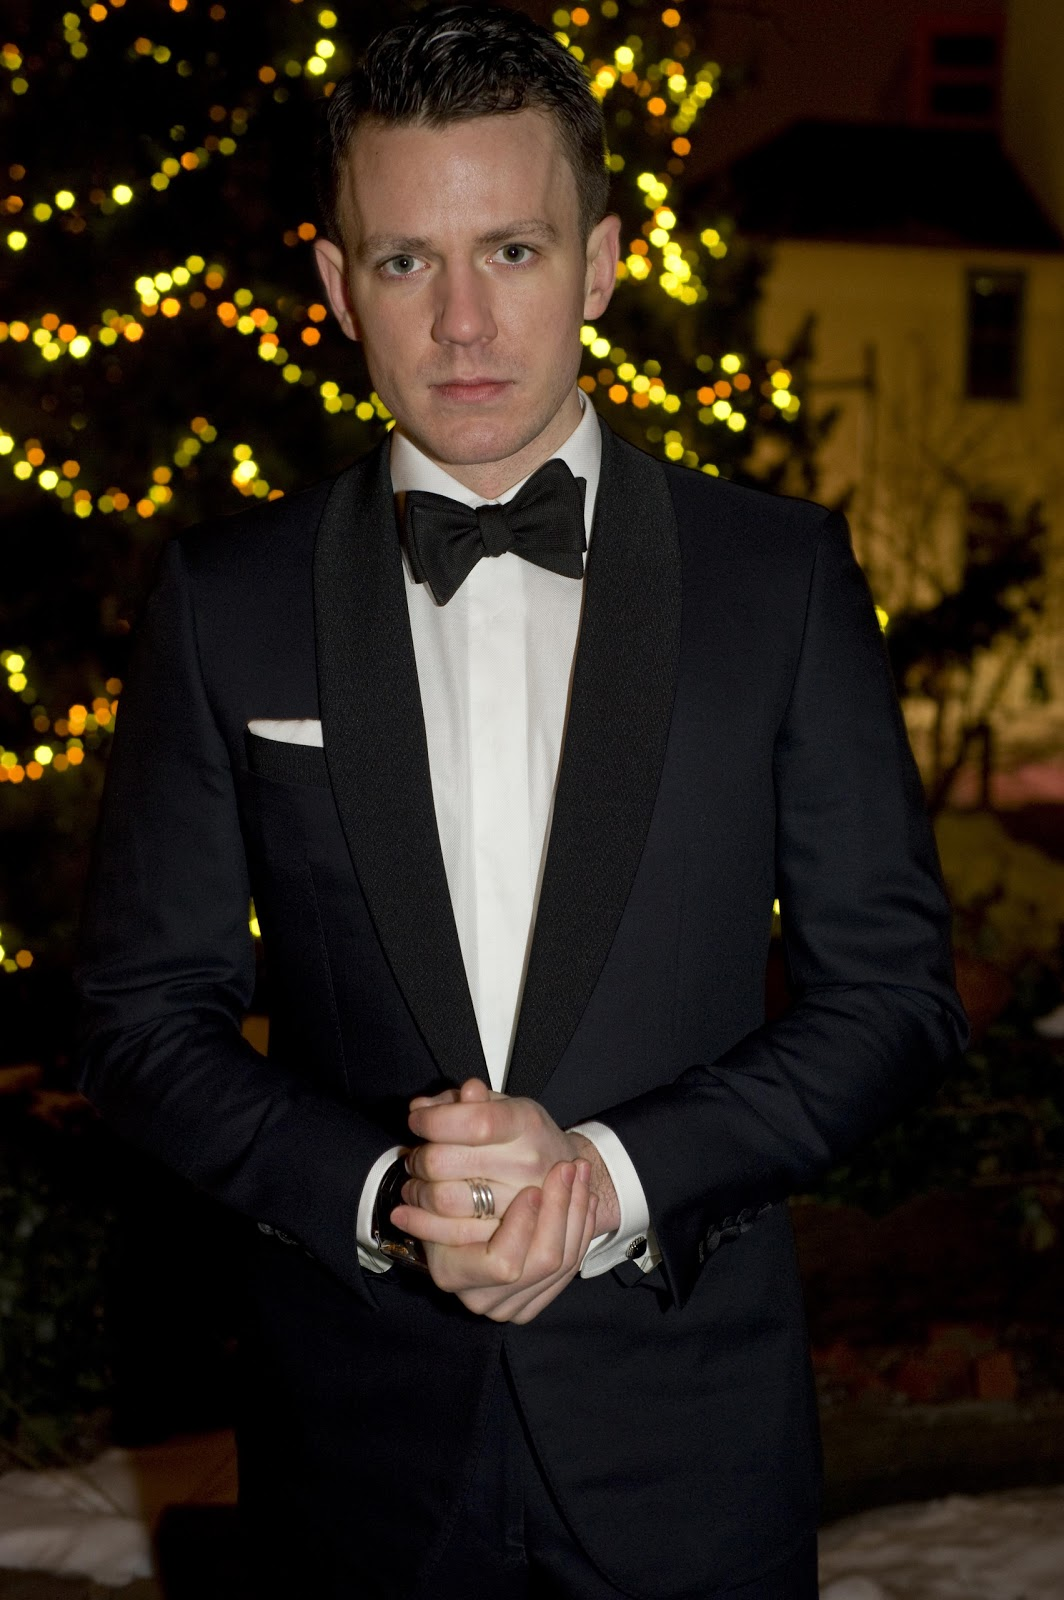 Midnight blue tuxedo, white